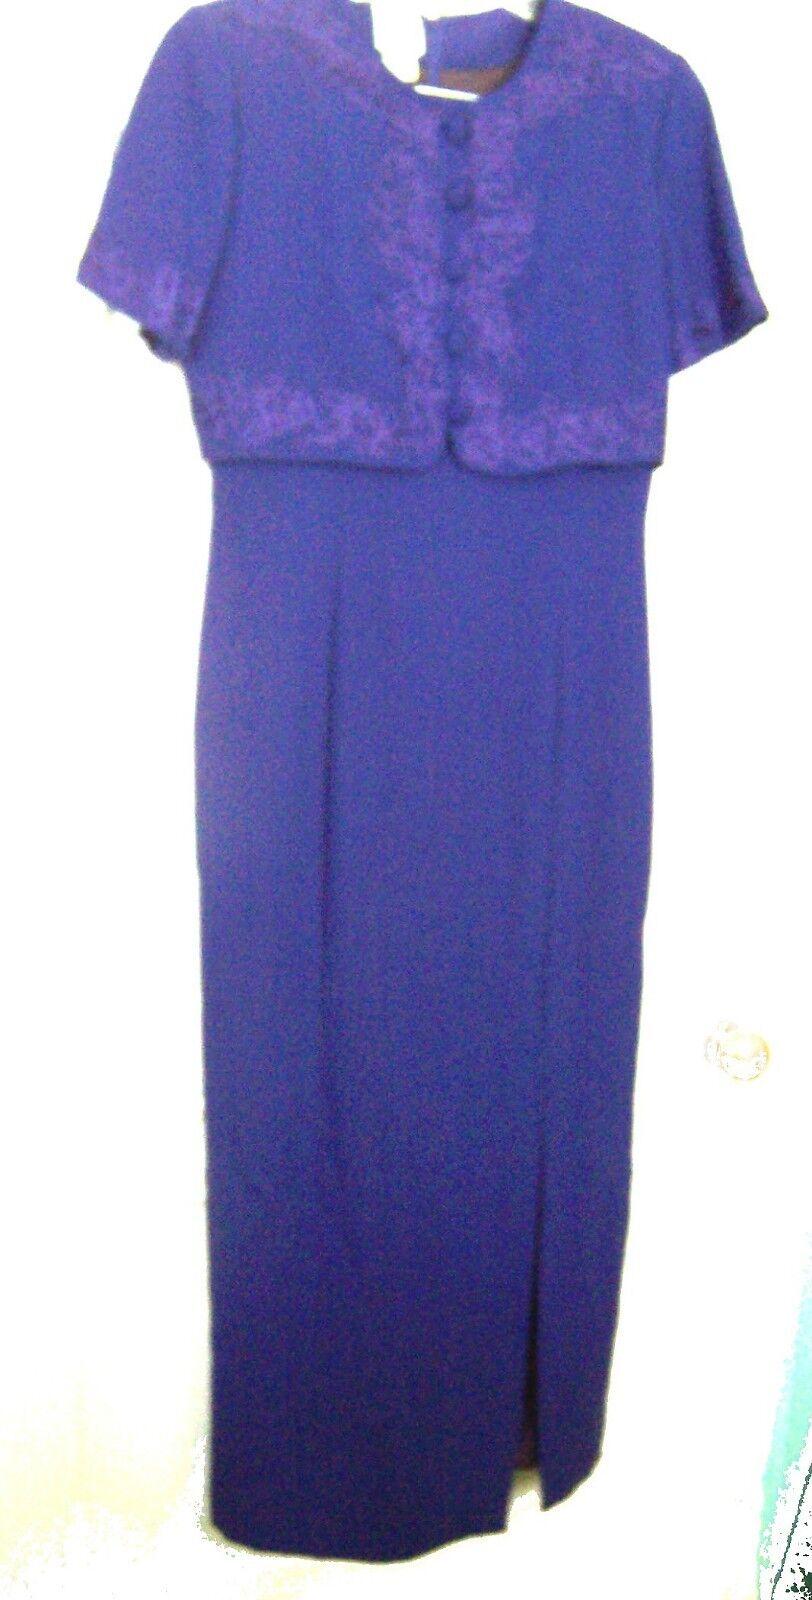 Studio by Pat silveri blueee Dress w Ribbon Embroidery Short Sleeve Dress Size 8